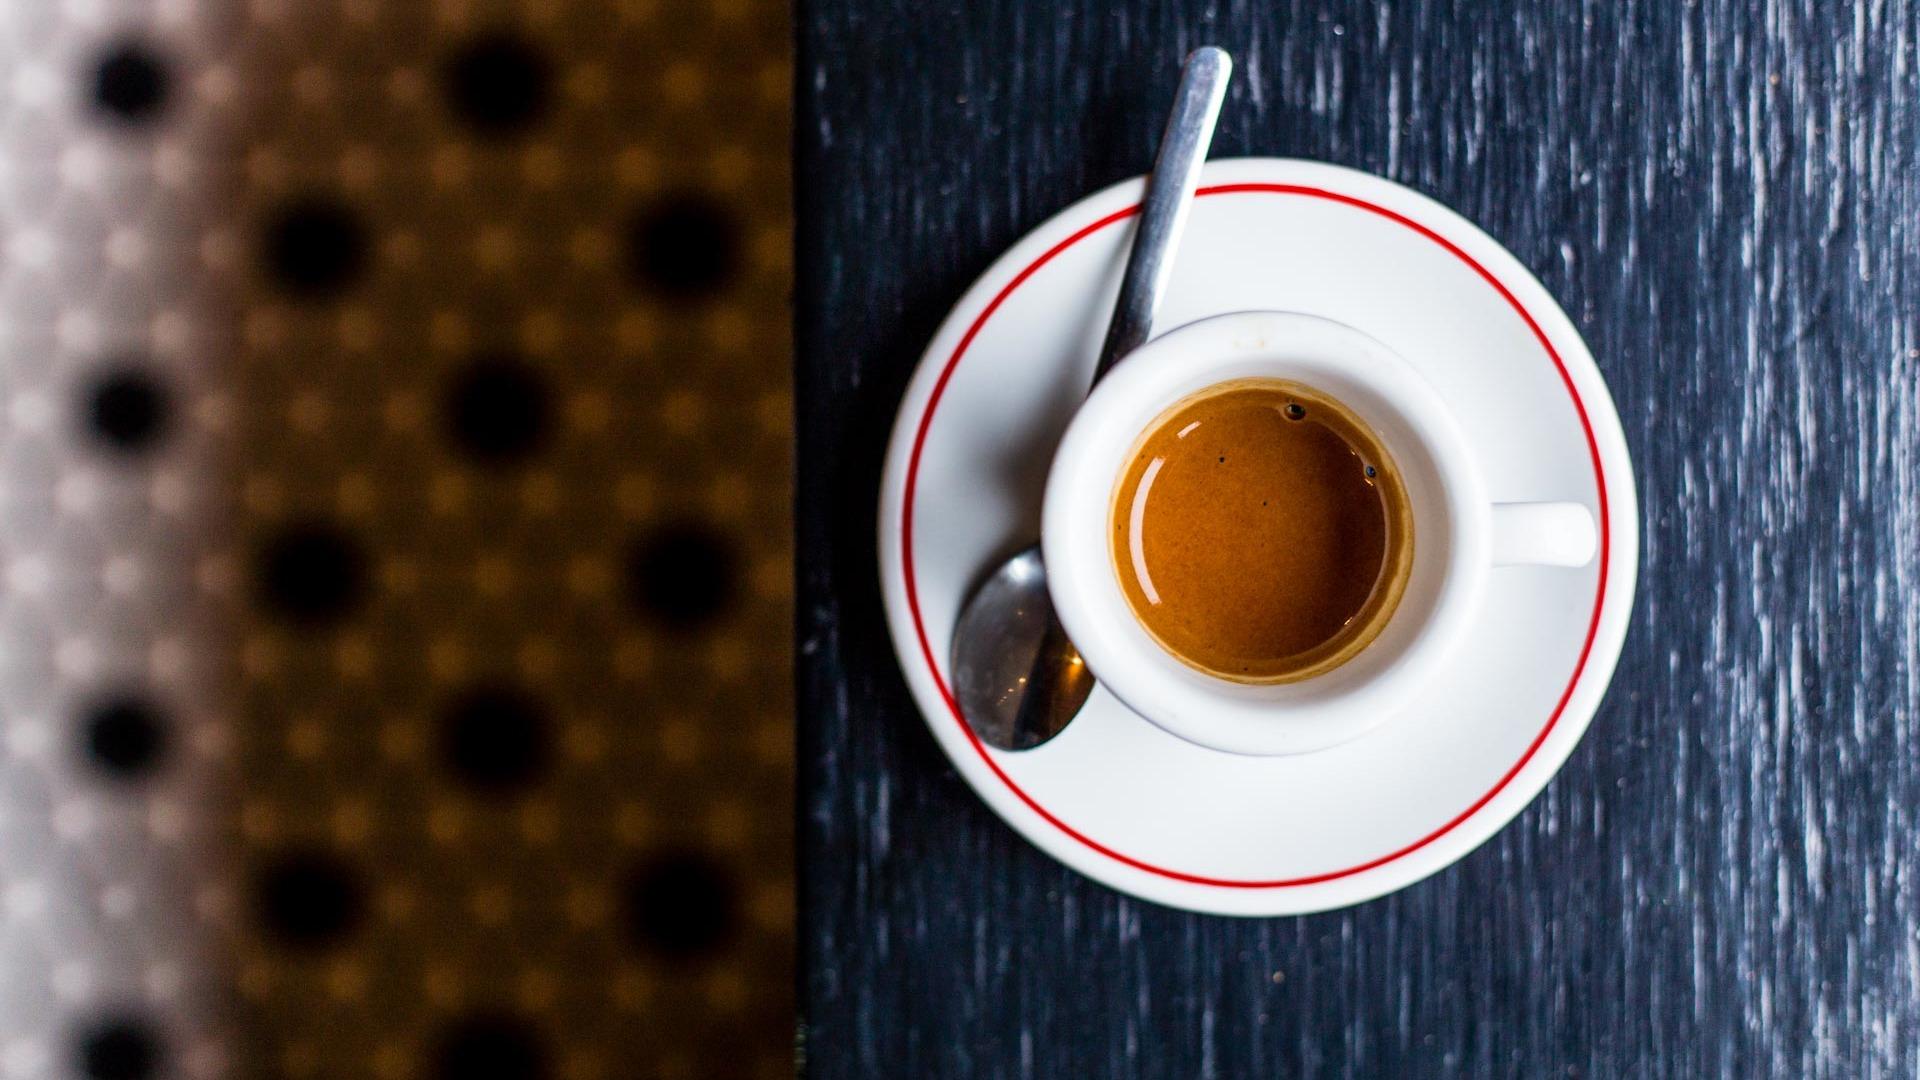 Caffe vita coffee roasting company 6